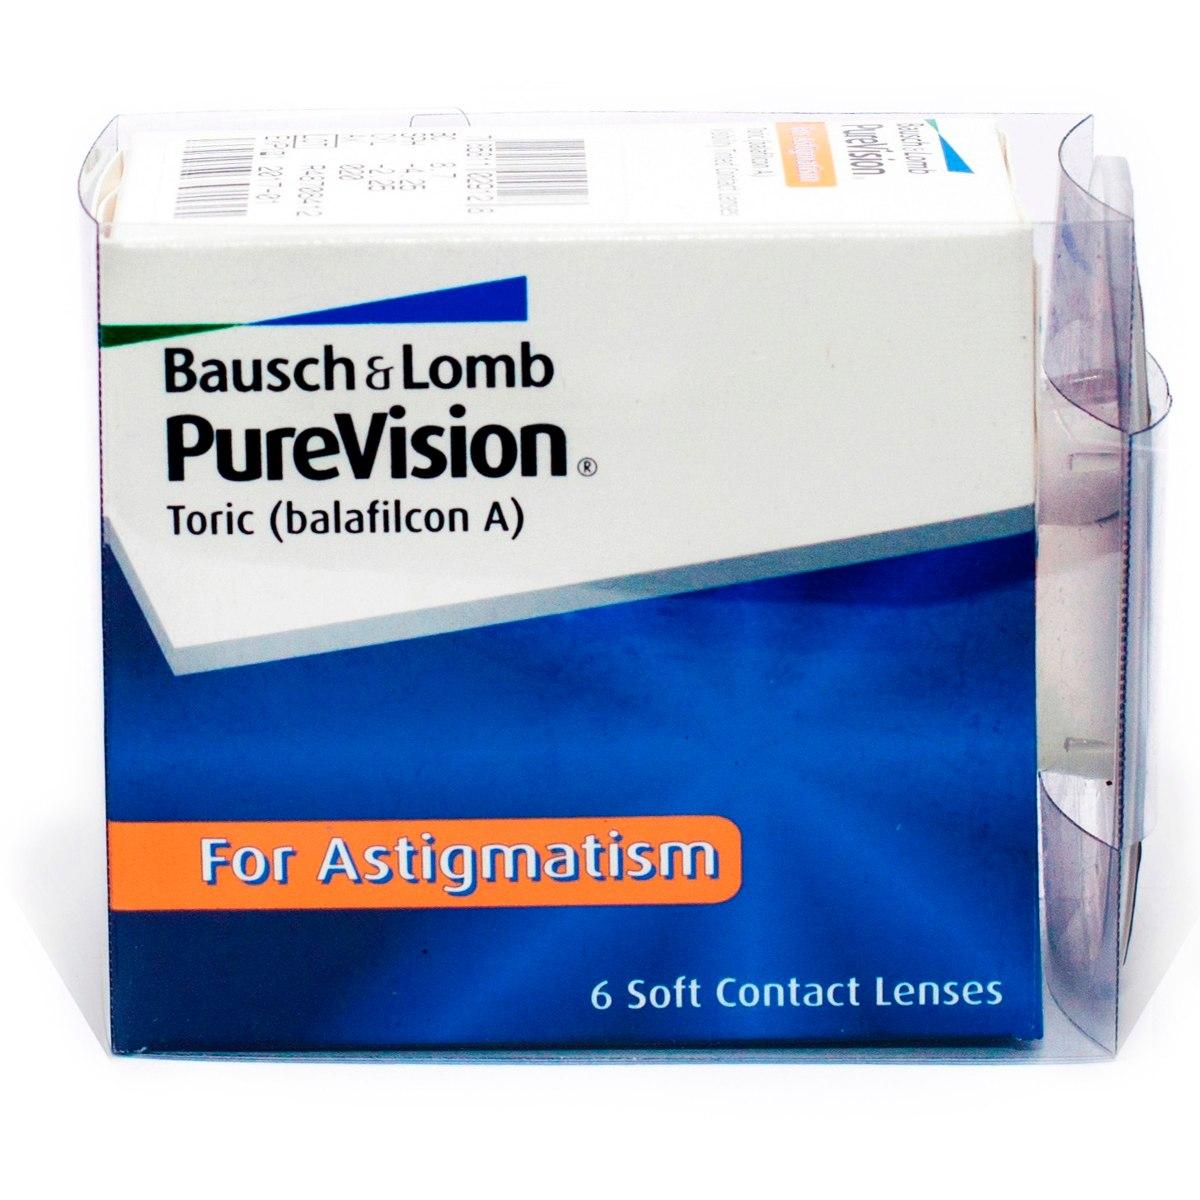 5b0067631ca0c lentes de contato purevision toric para astigmatismo. Carregando zoom.